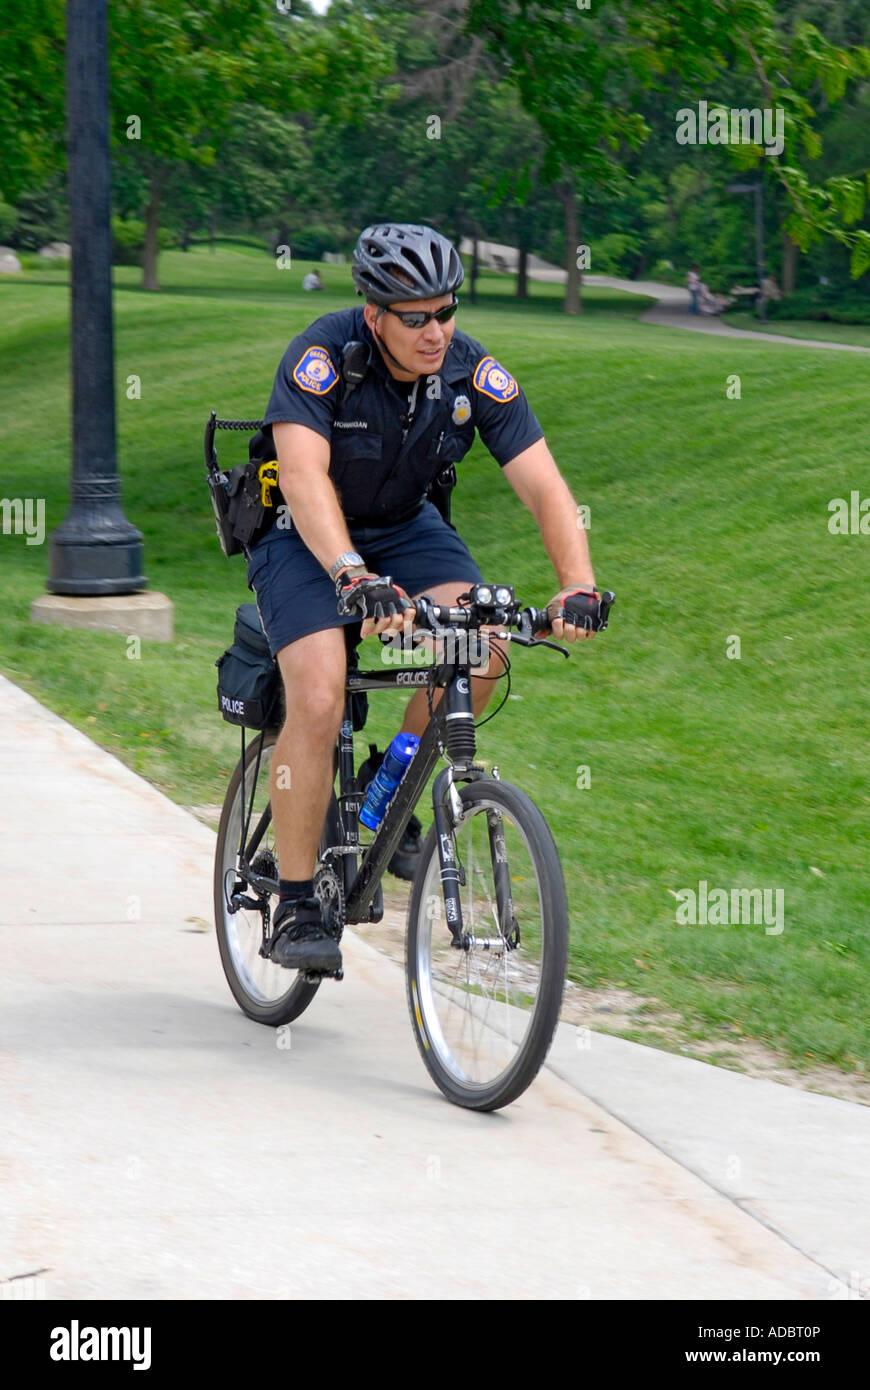 Grand Rapids Michigan Policeman patrol downtown streets on bicycles - Stock Image